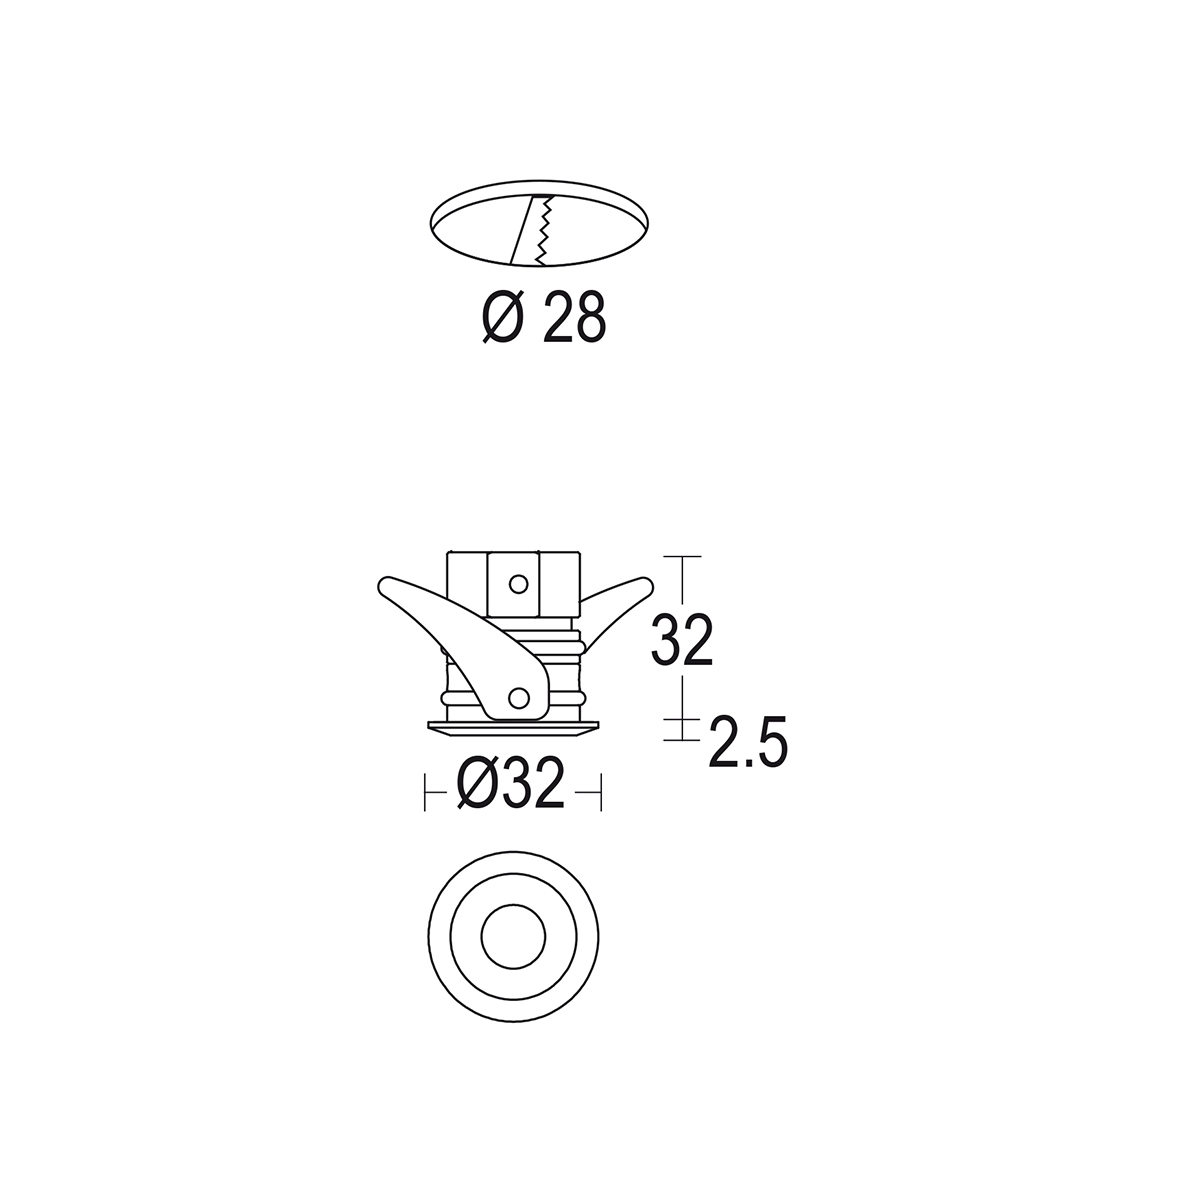 чертеж Microsegno 32 Ghidini уличный светильник GH1063.BAMT300EC